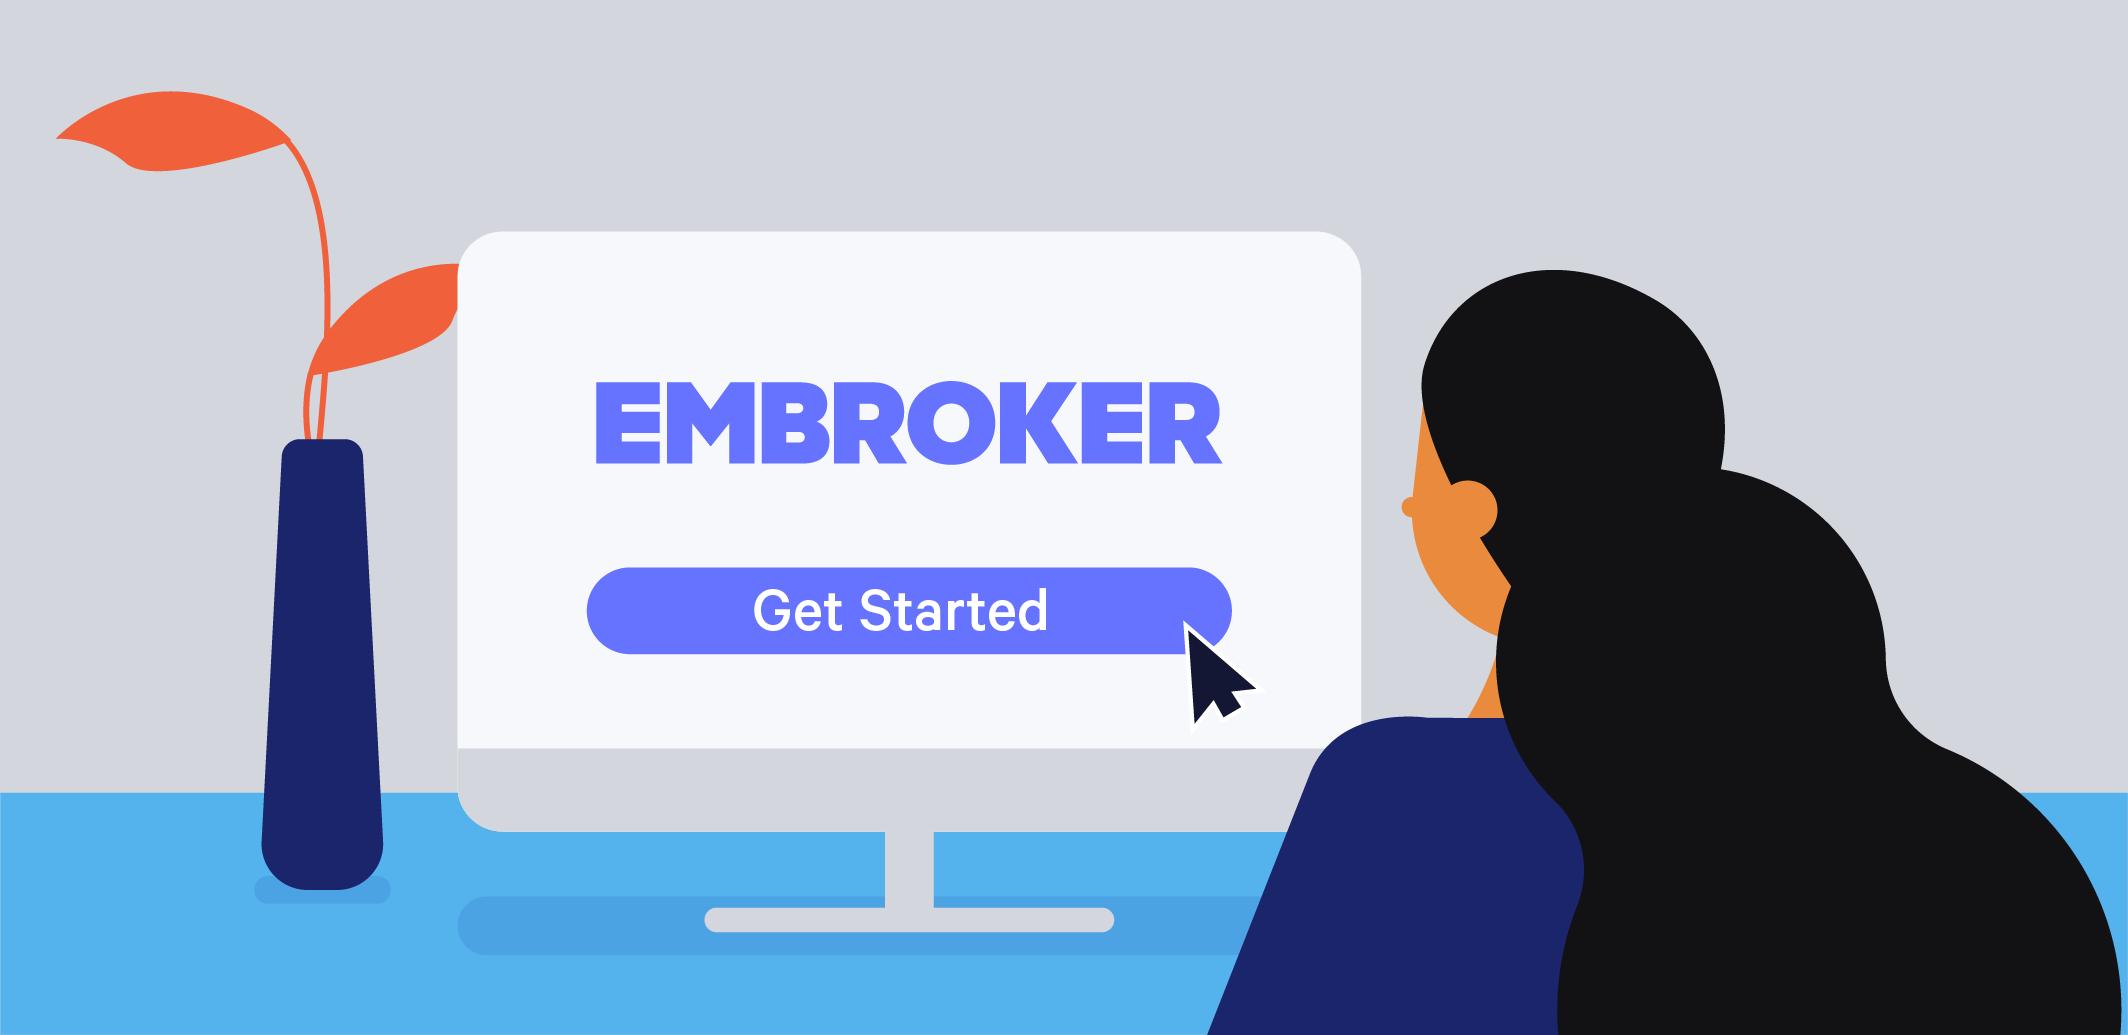 Embroker vs Founder Shield illustration